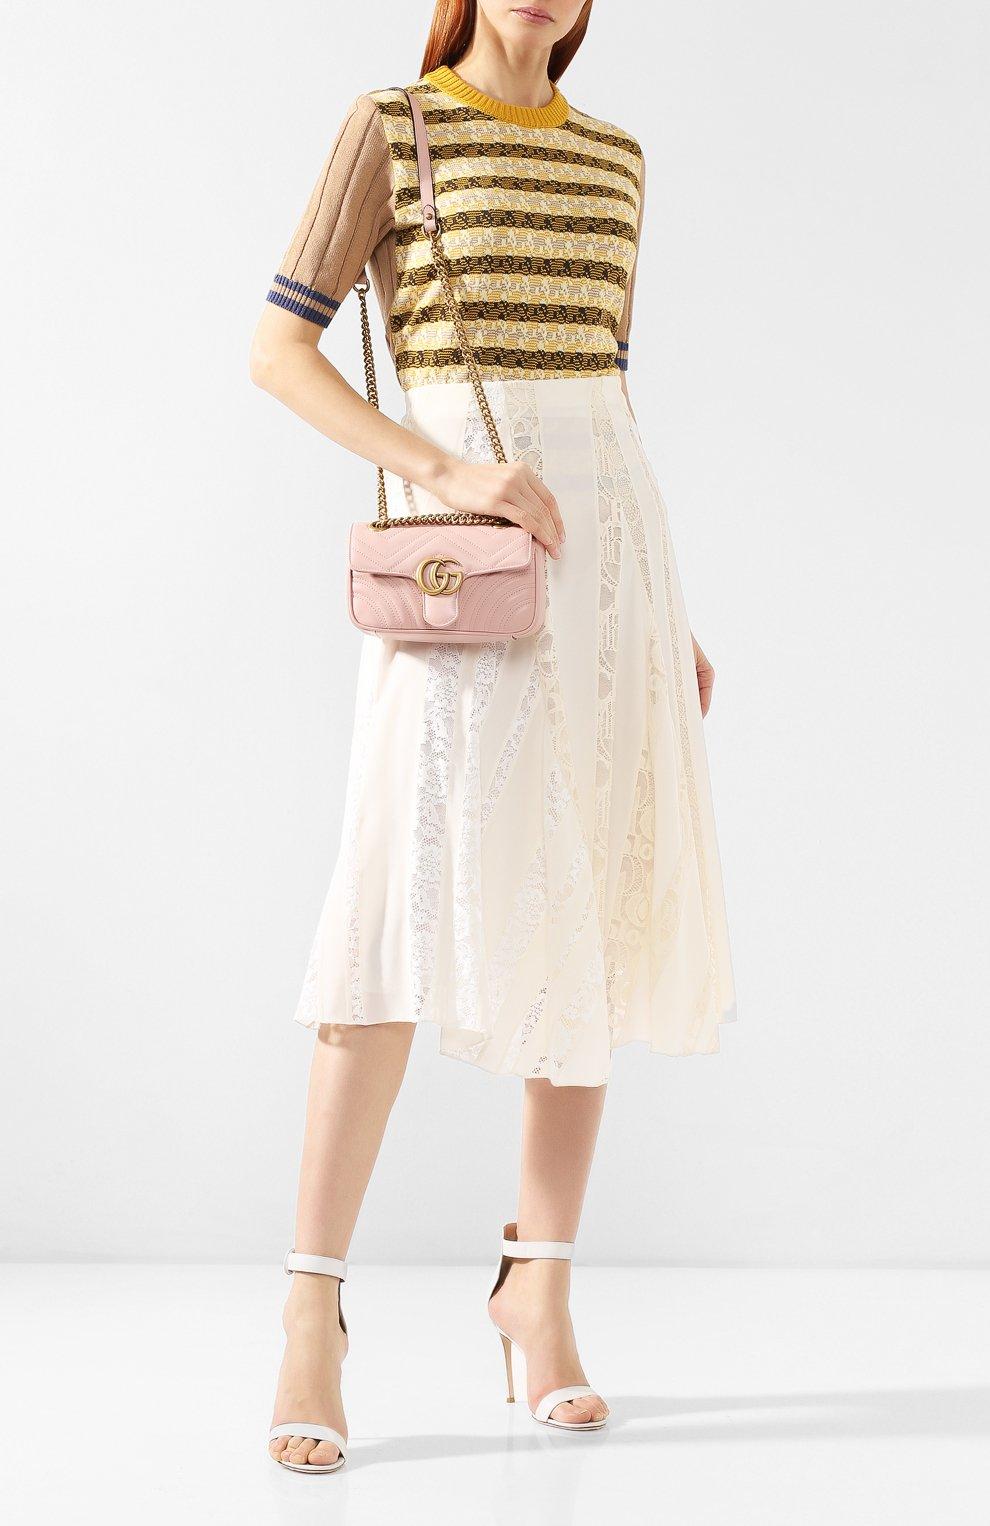 Сумка GG Marmont Gucci розовая цвета | Фото №2